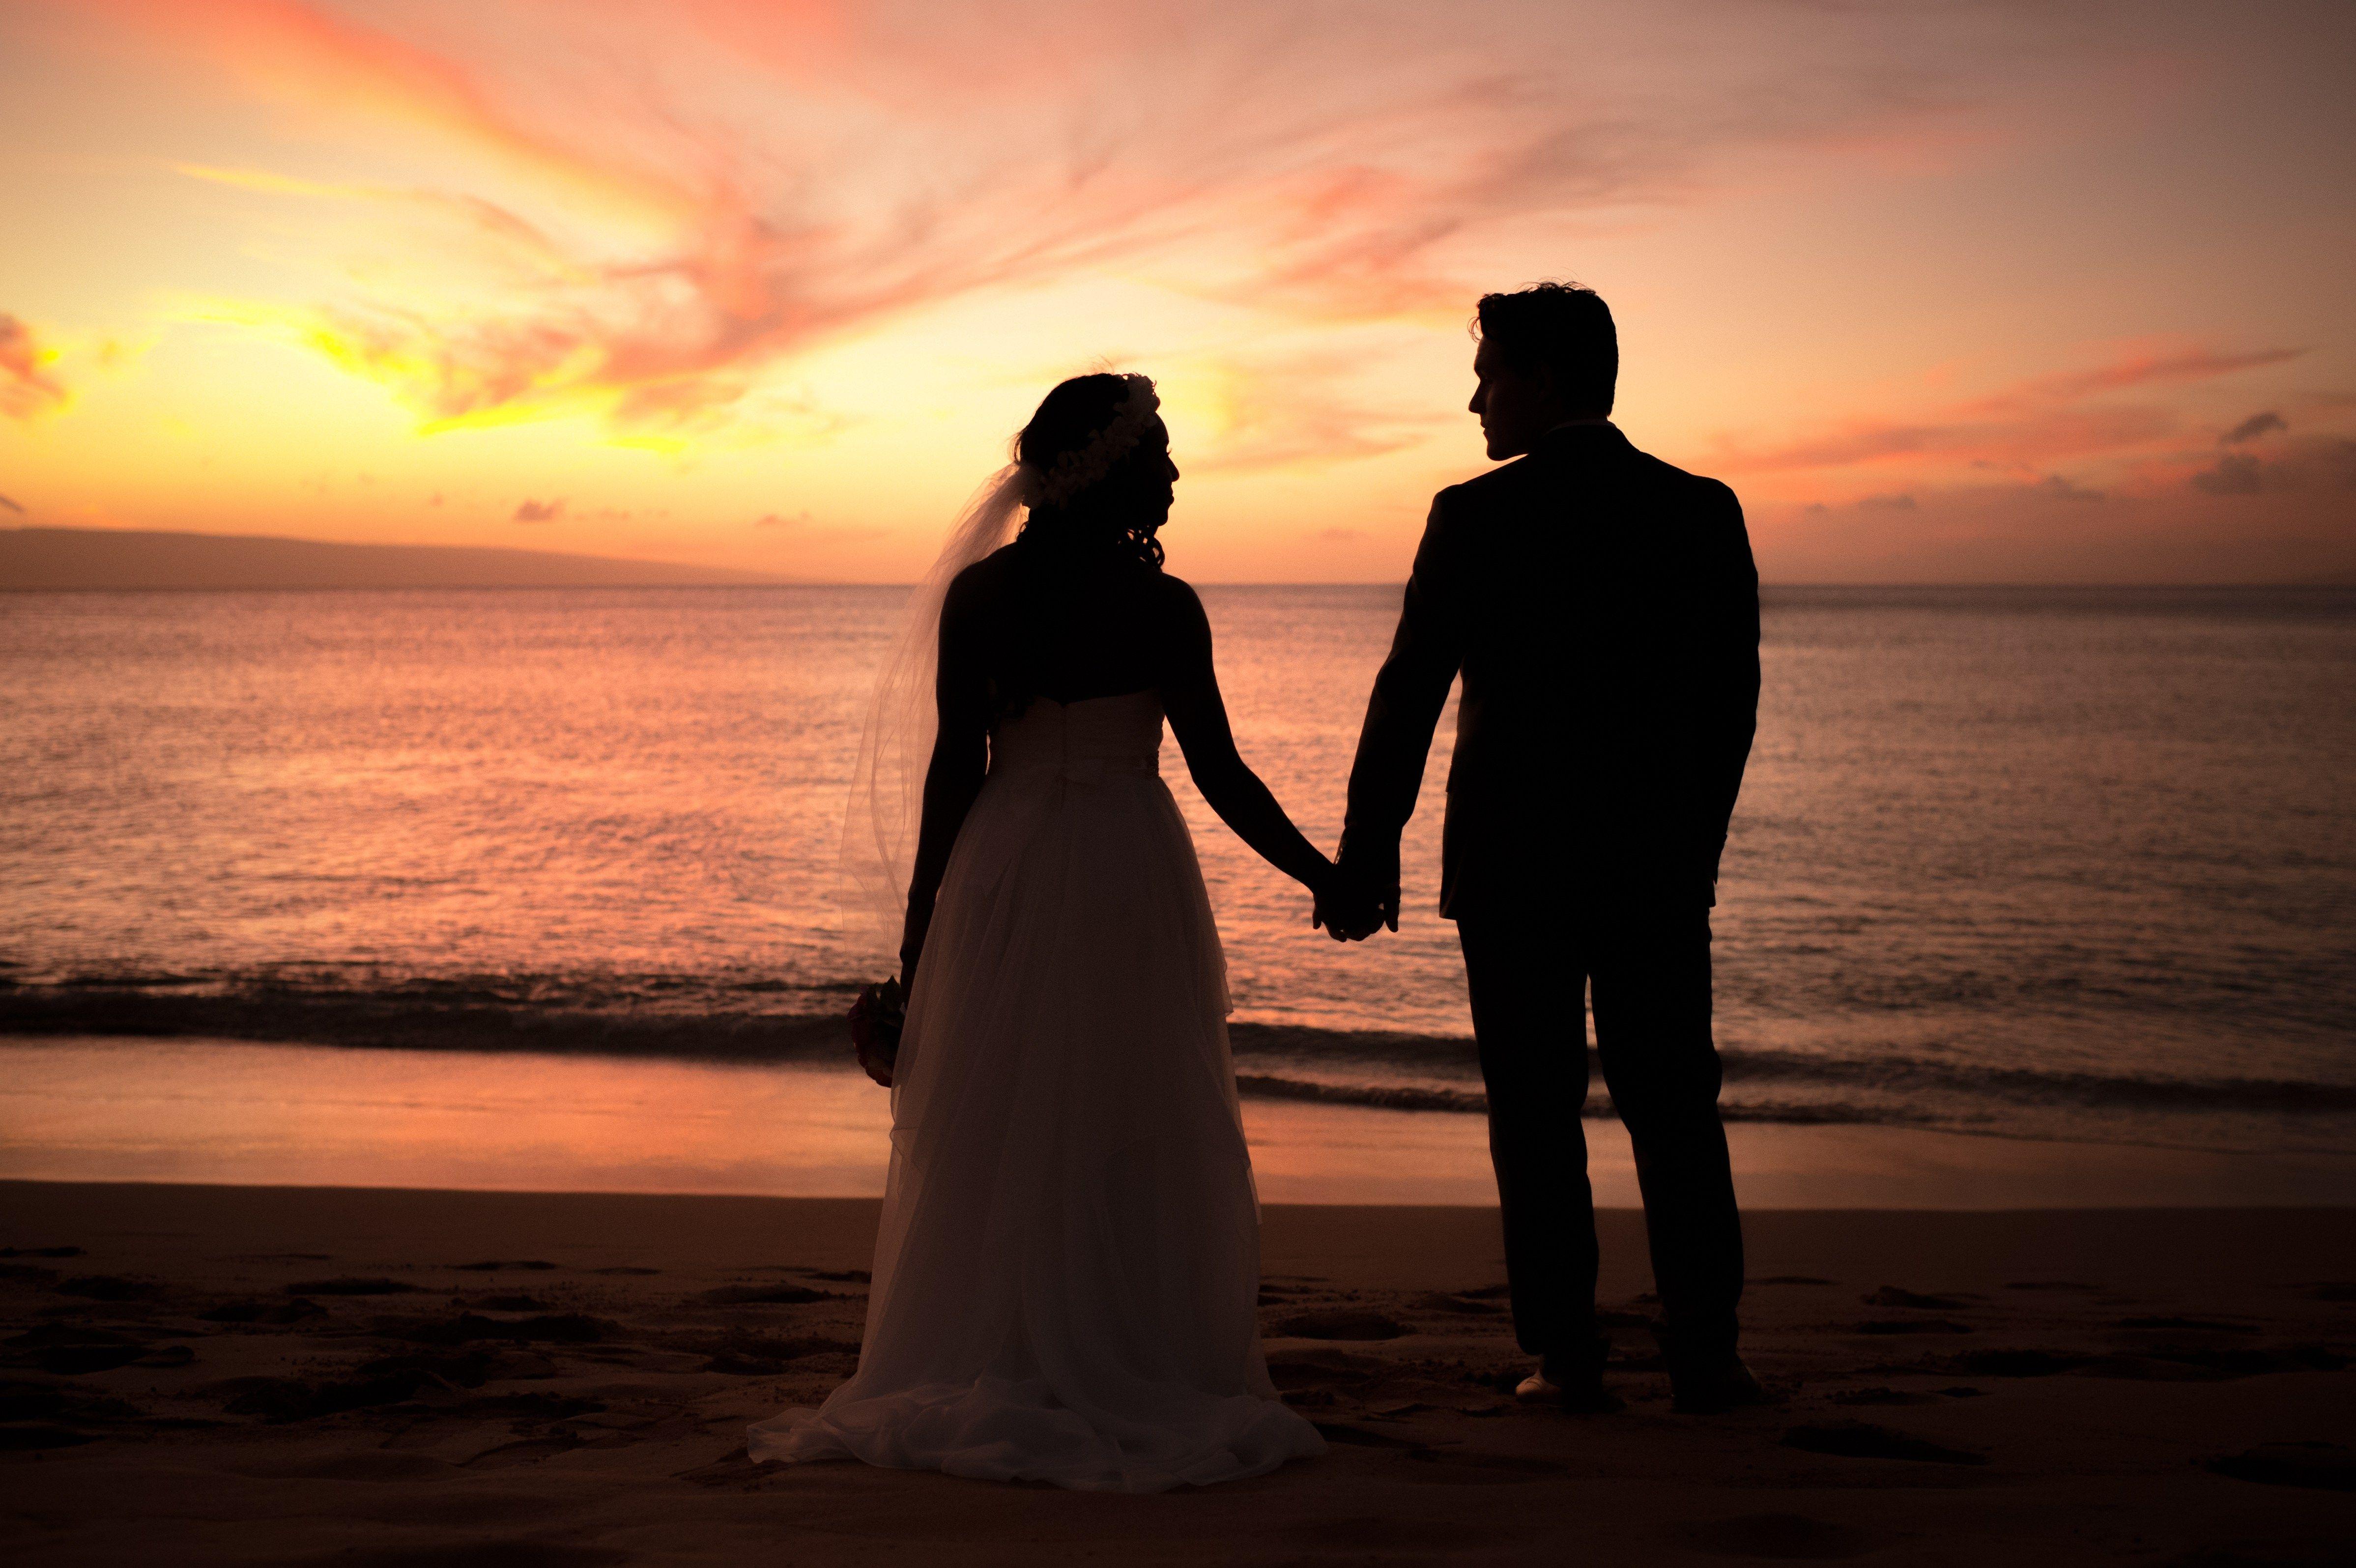 Sunset, Maui, Hawaii Westin Hotel Interracial Couple Love